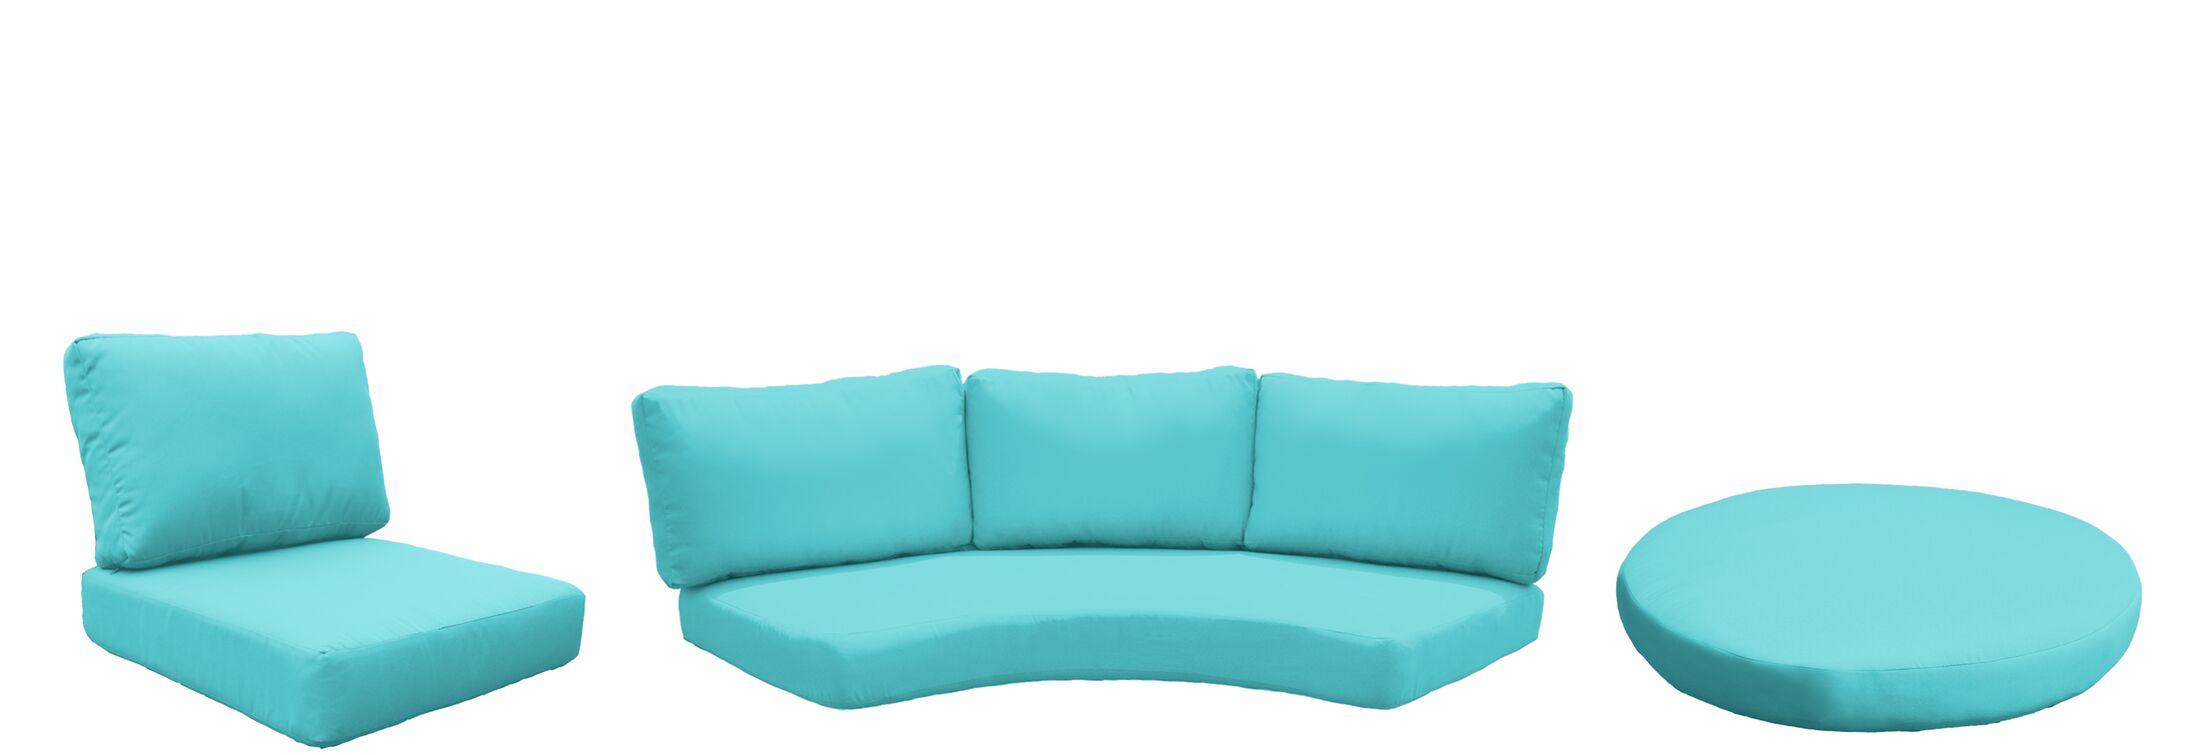 Barbados 11 Piece Outdoor Cushion Set Fabric: Aruba